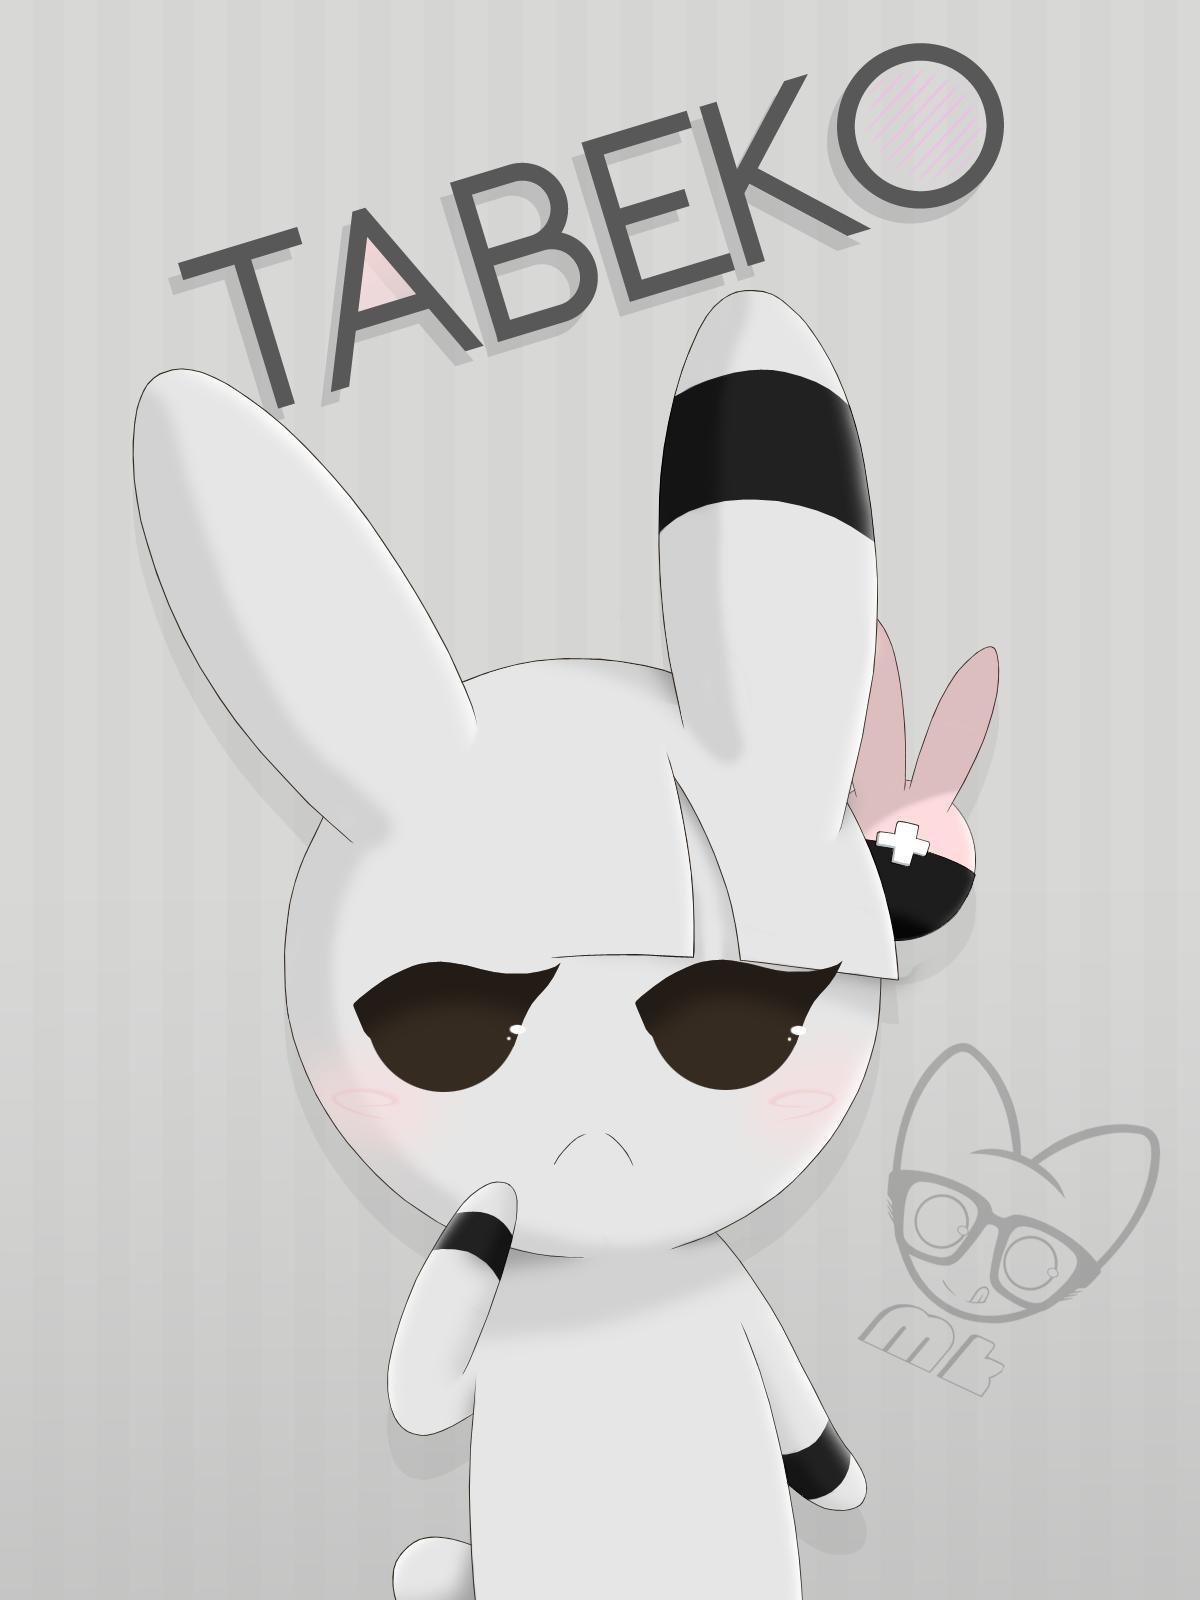 Tabeko Silly